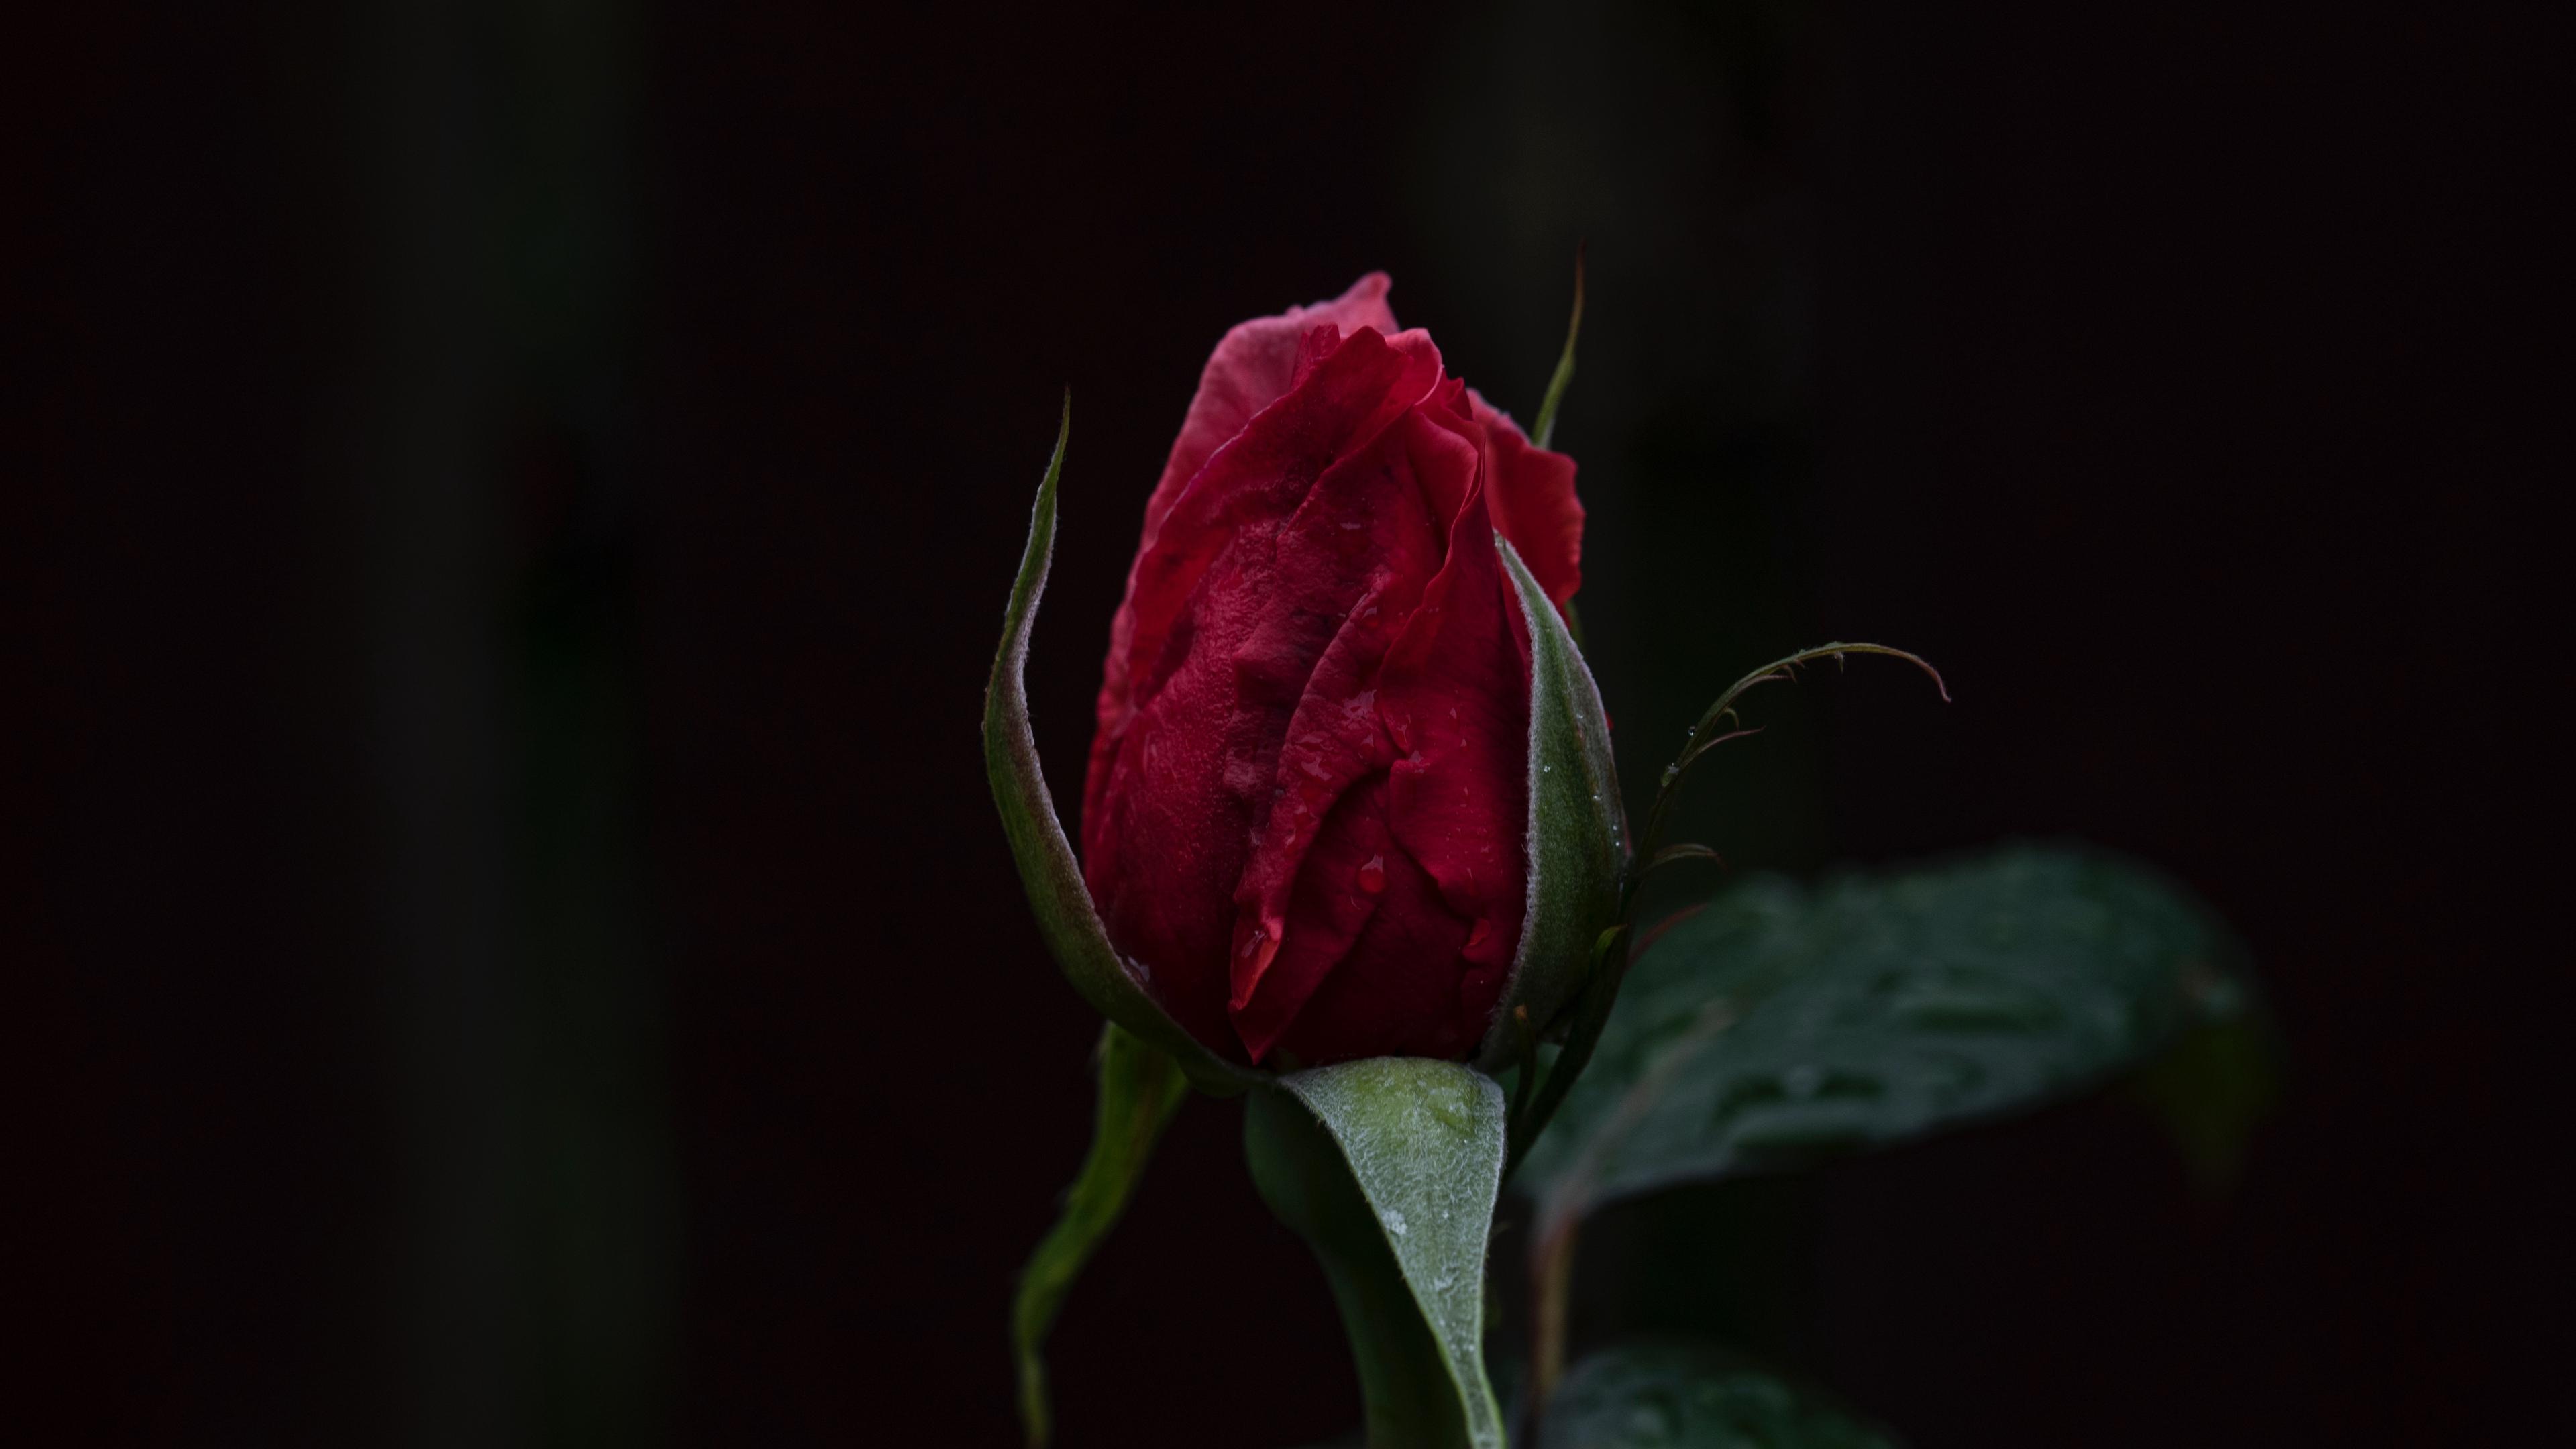 rose bud dark background 4k 1540574352 - rose, bud, dark background 4k - Rose, dark background, bud